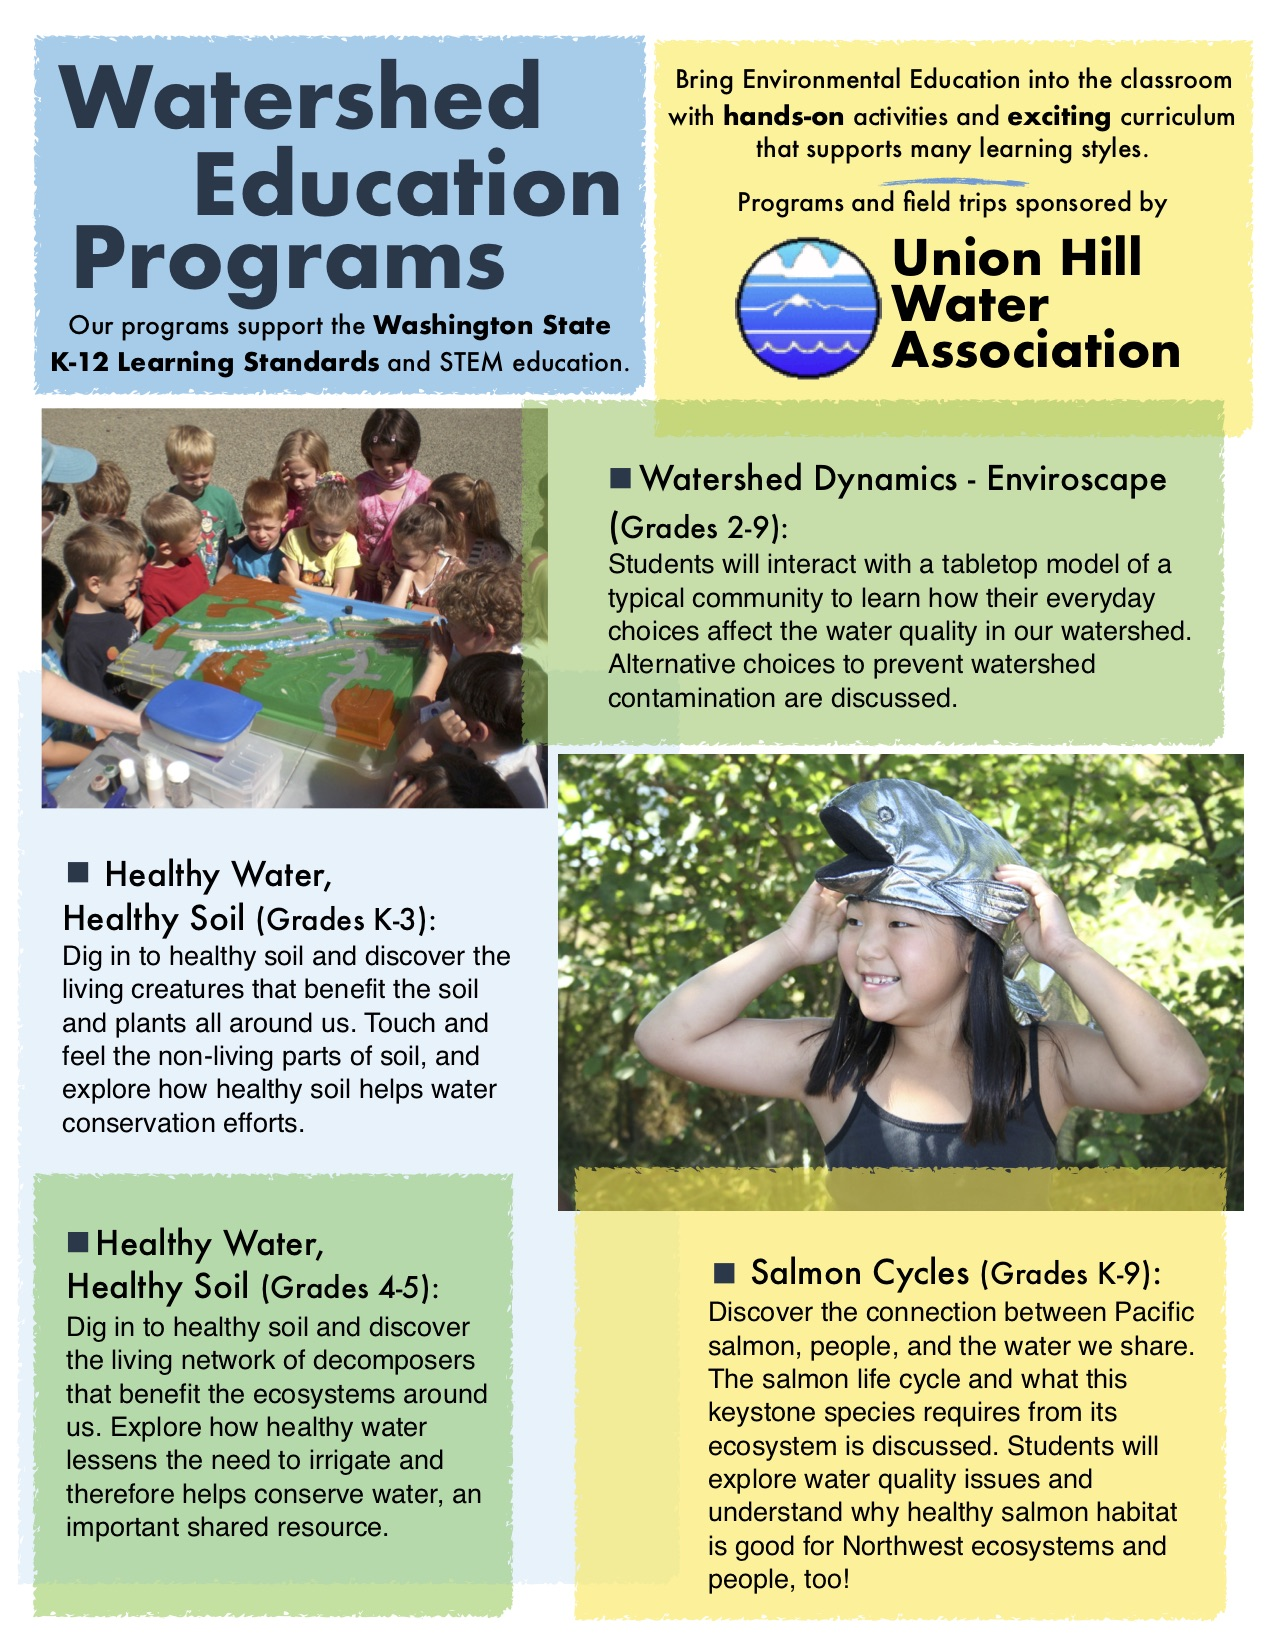 Union Hill Water Association